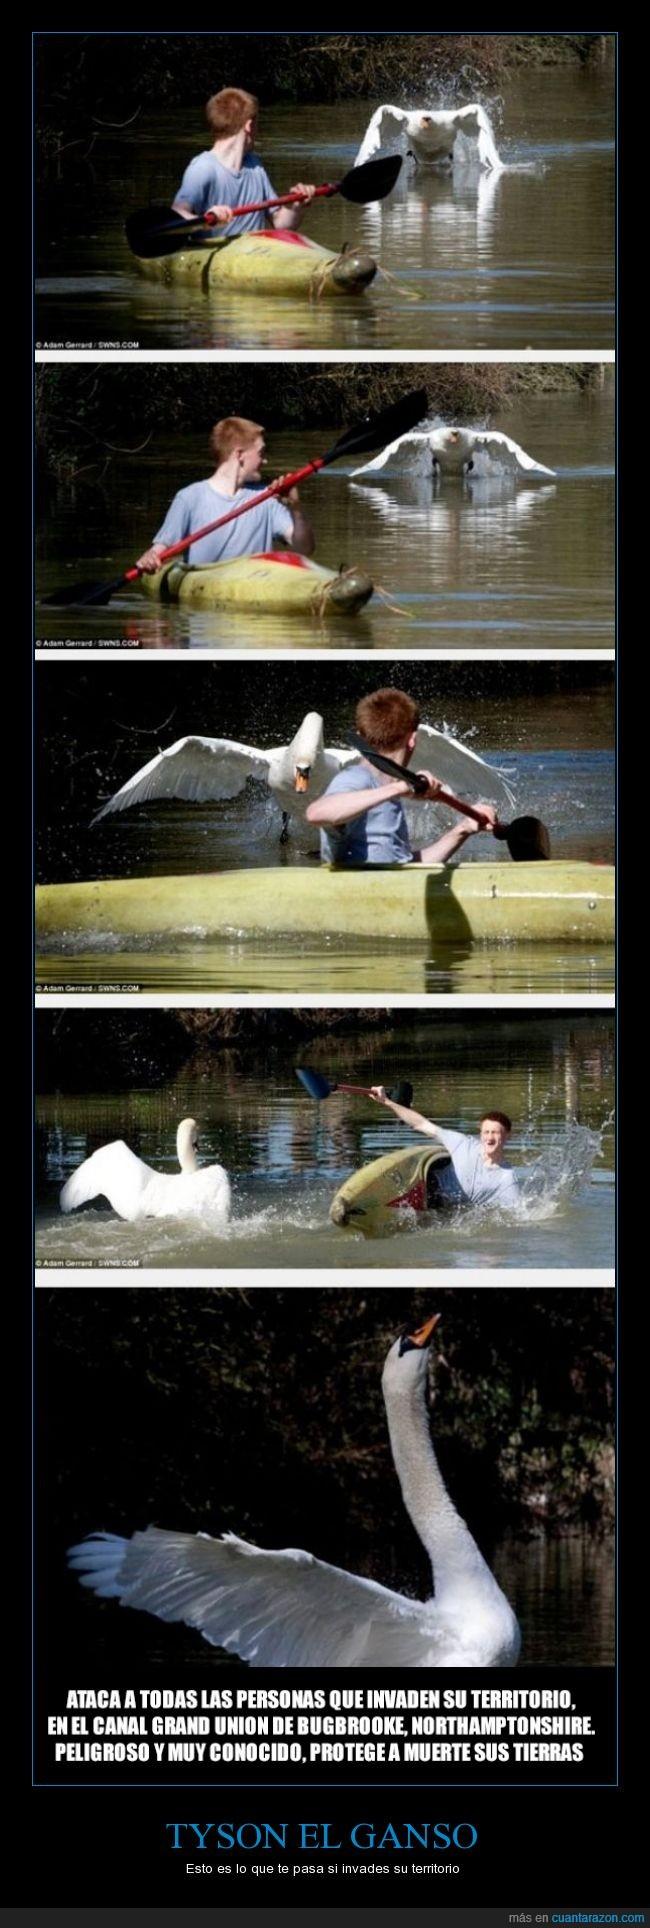 agua,bote,caer,ganso,niño,territorial,volar